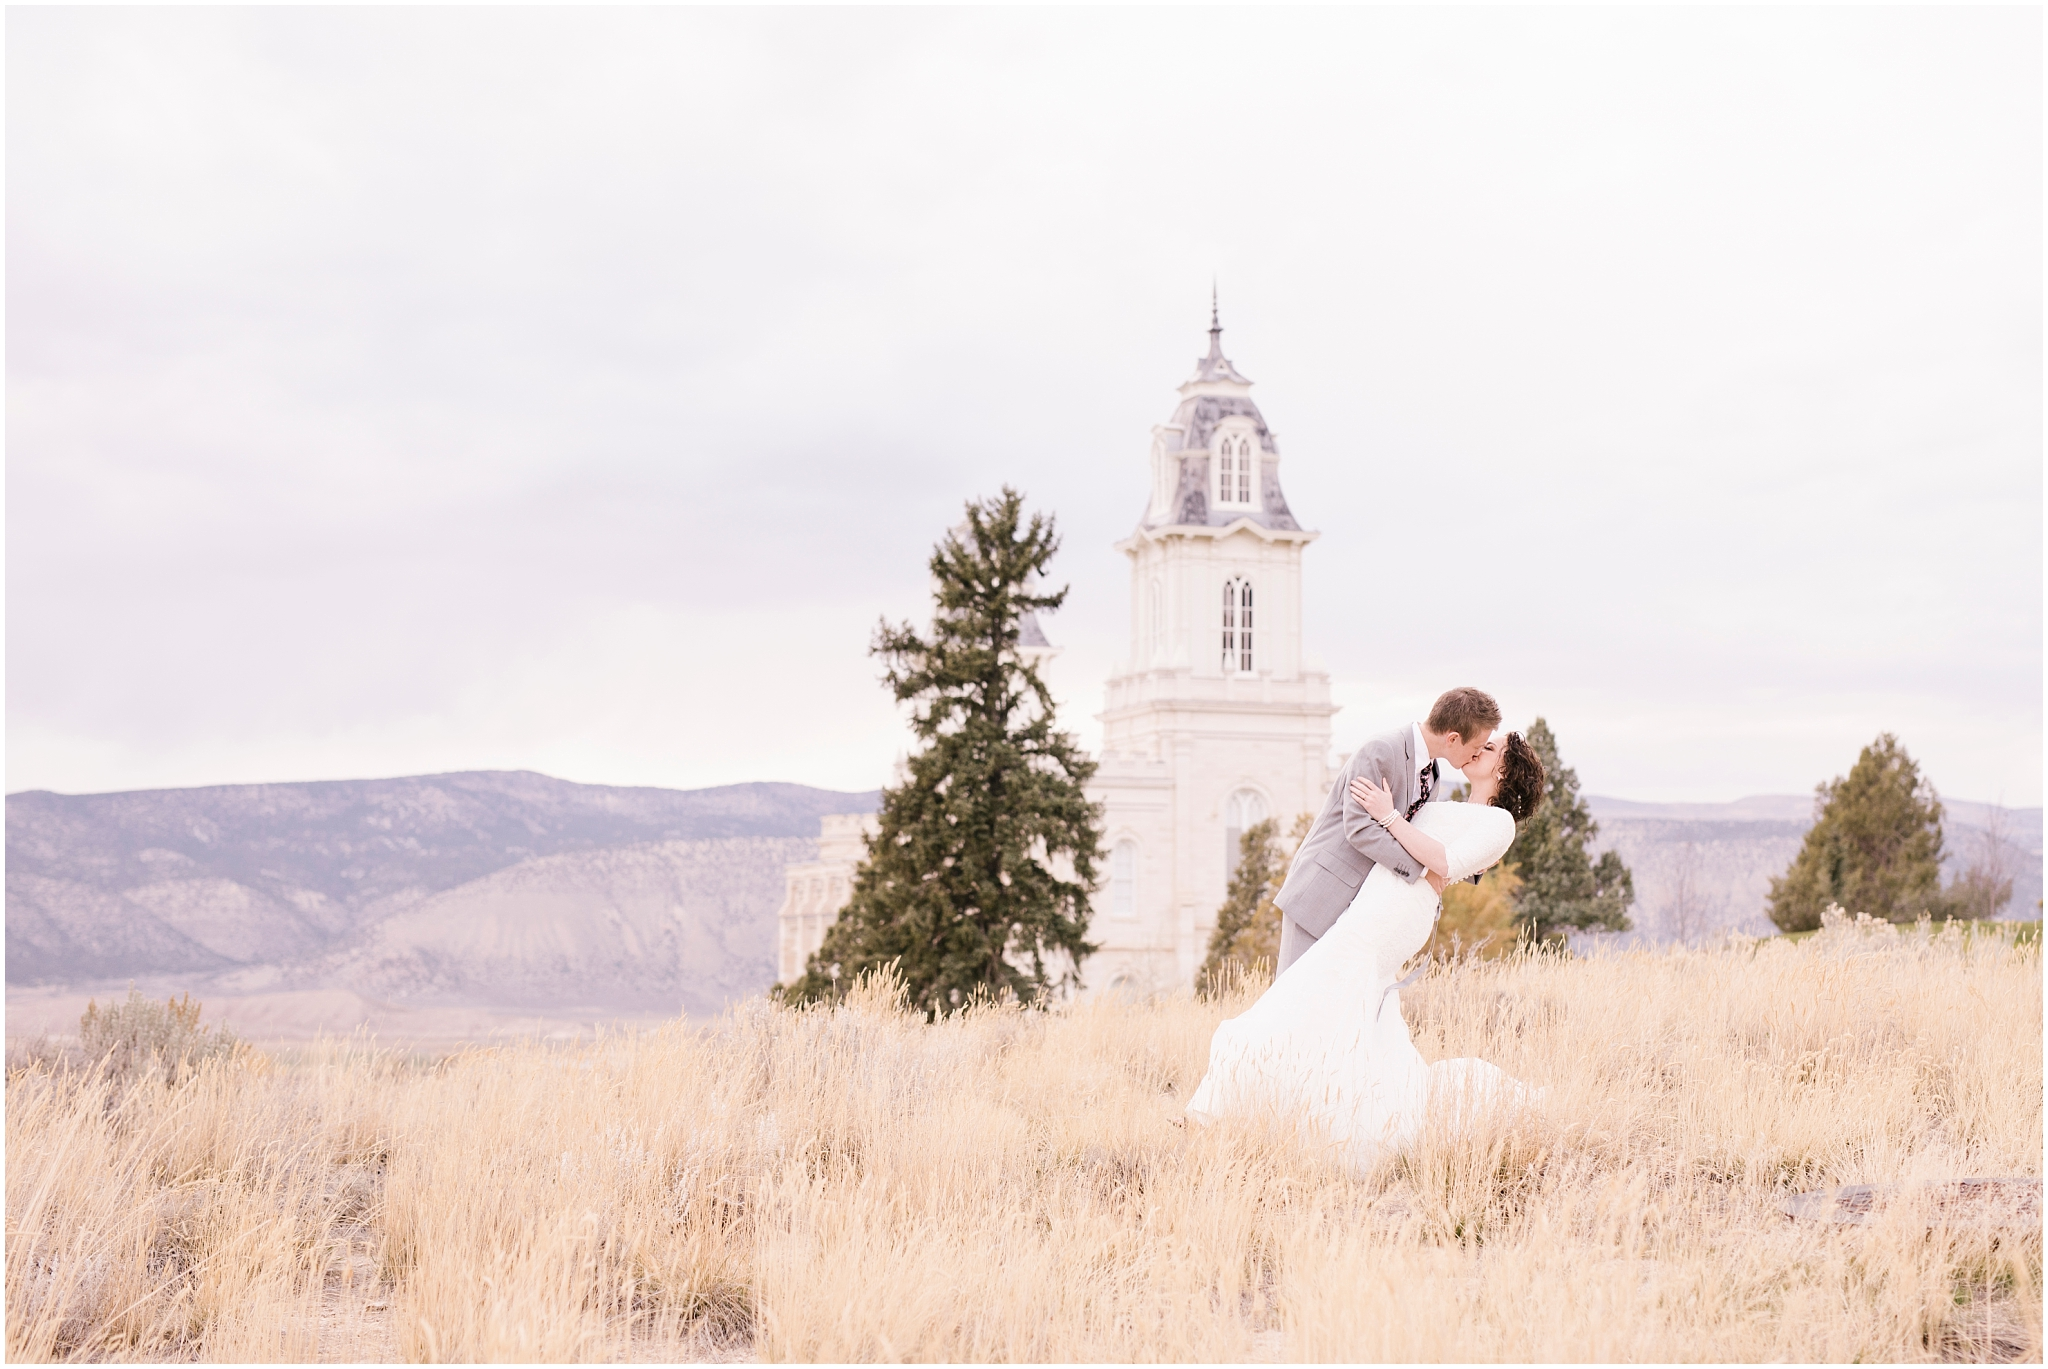 BA-Bridals-81_Lizzie-B-Imagery-Utah-Wedding-Photographer-Central-Utah-Photographer-Utah-County-Manti-Utah-Temple.jpg